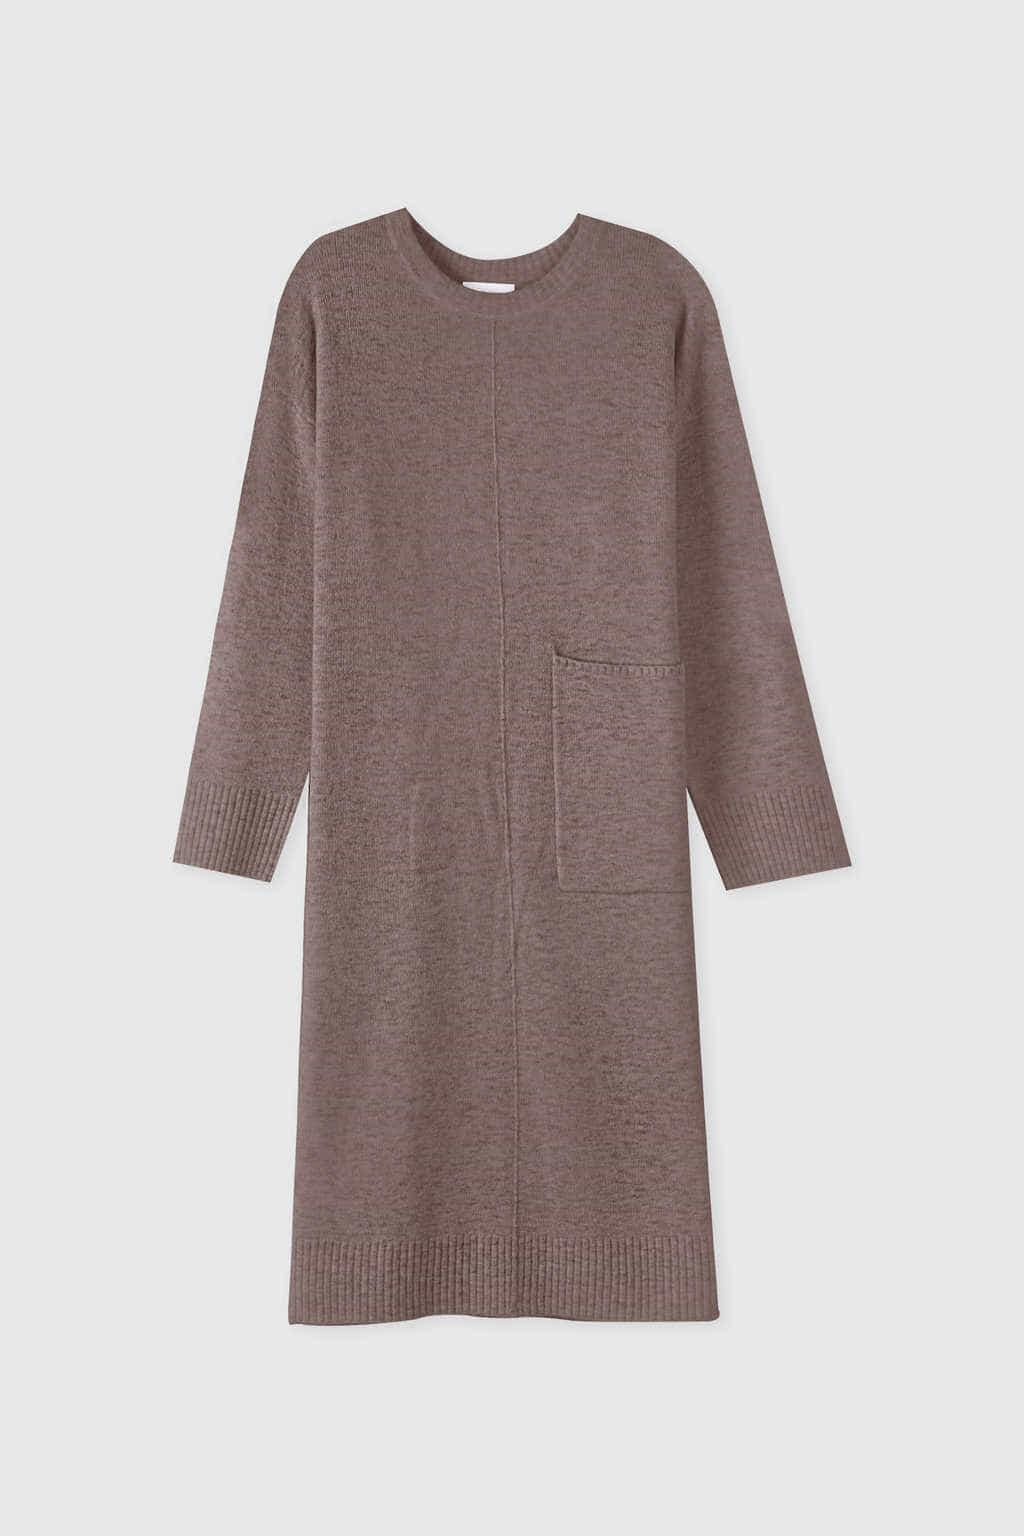 Dress 2604 Brown 7